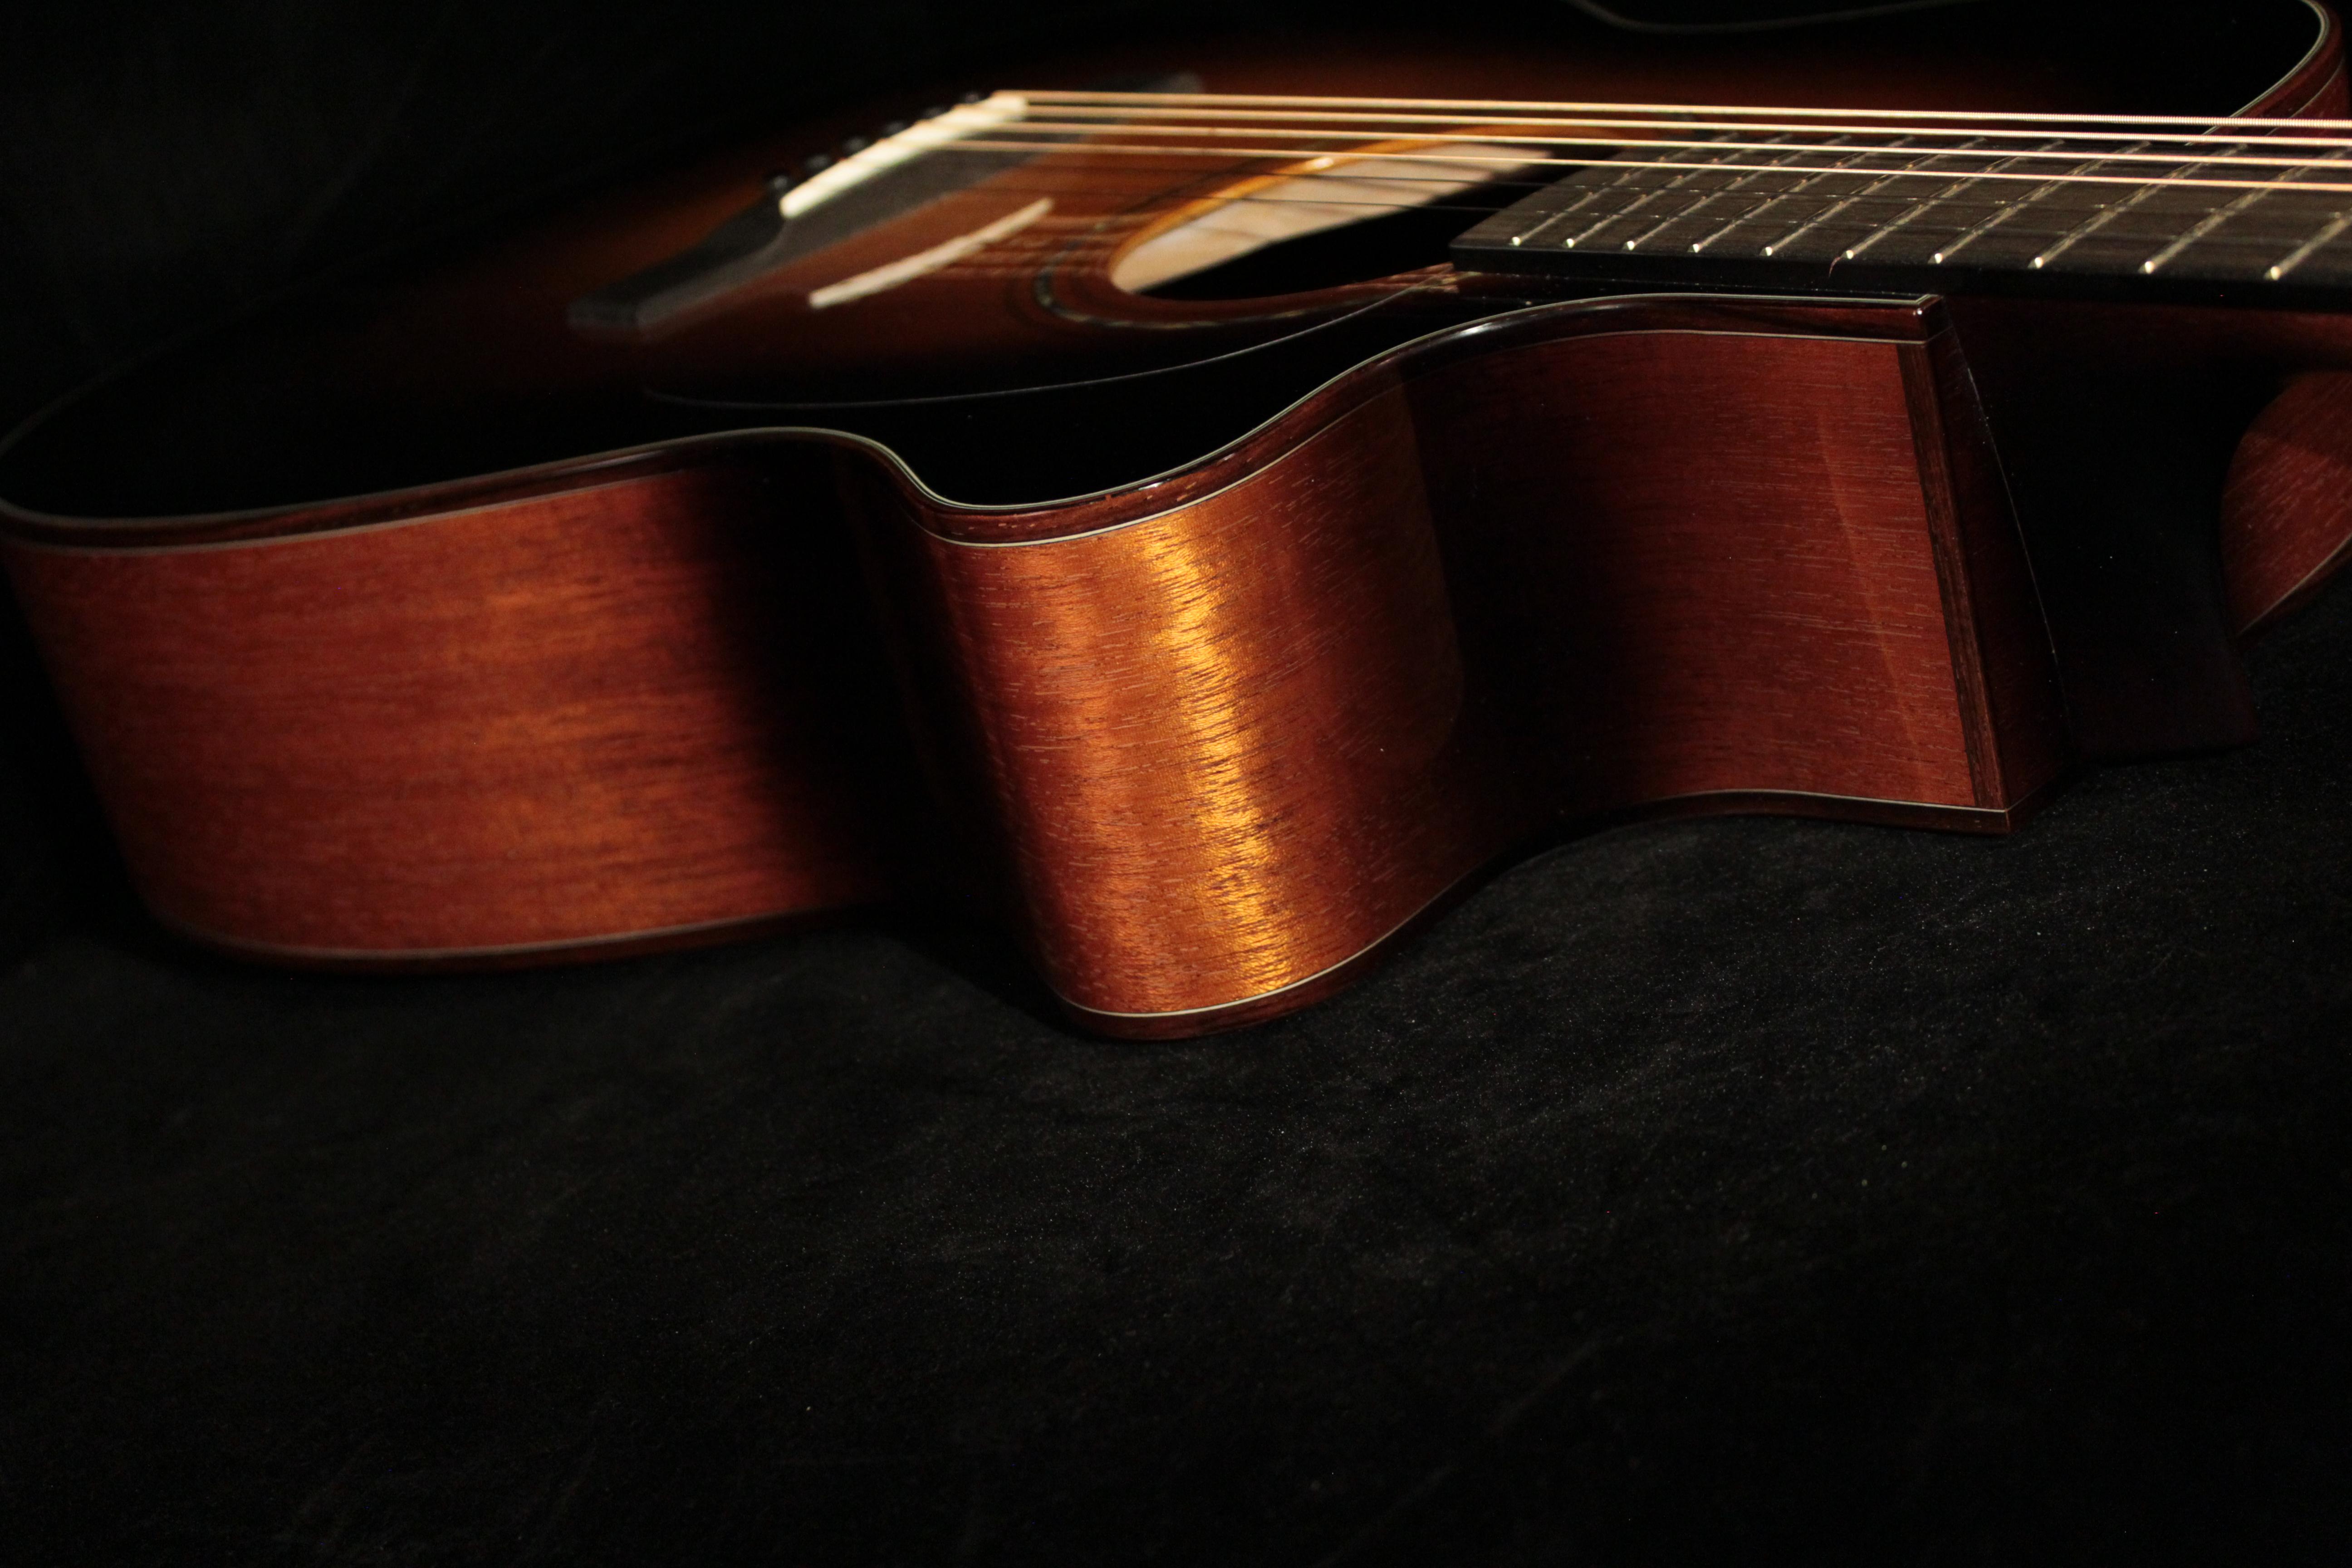 Webber Orchestra Model Cutaway